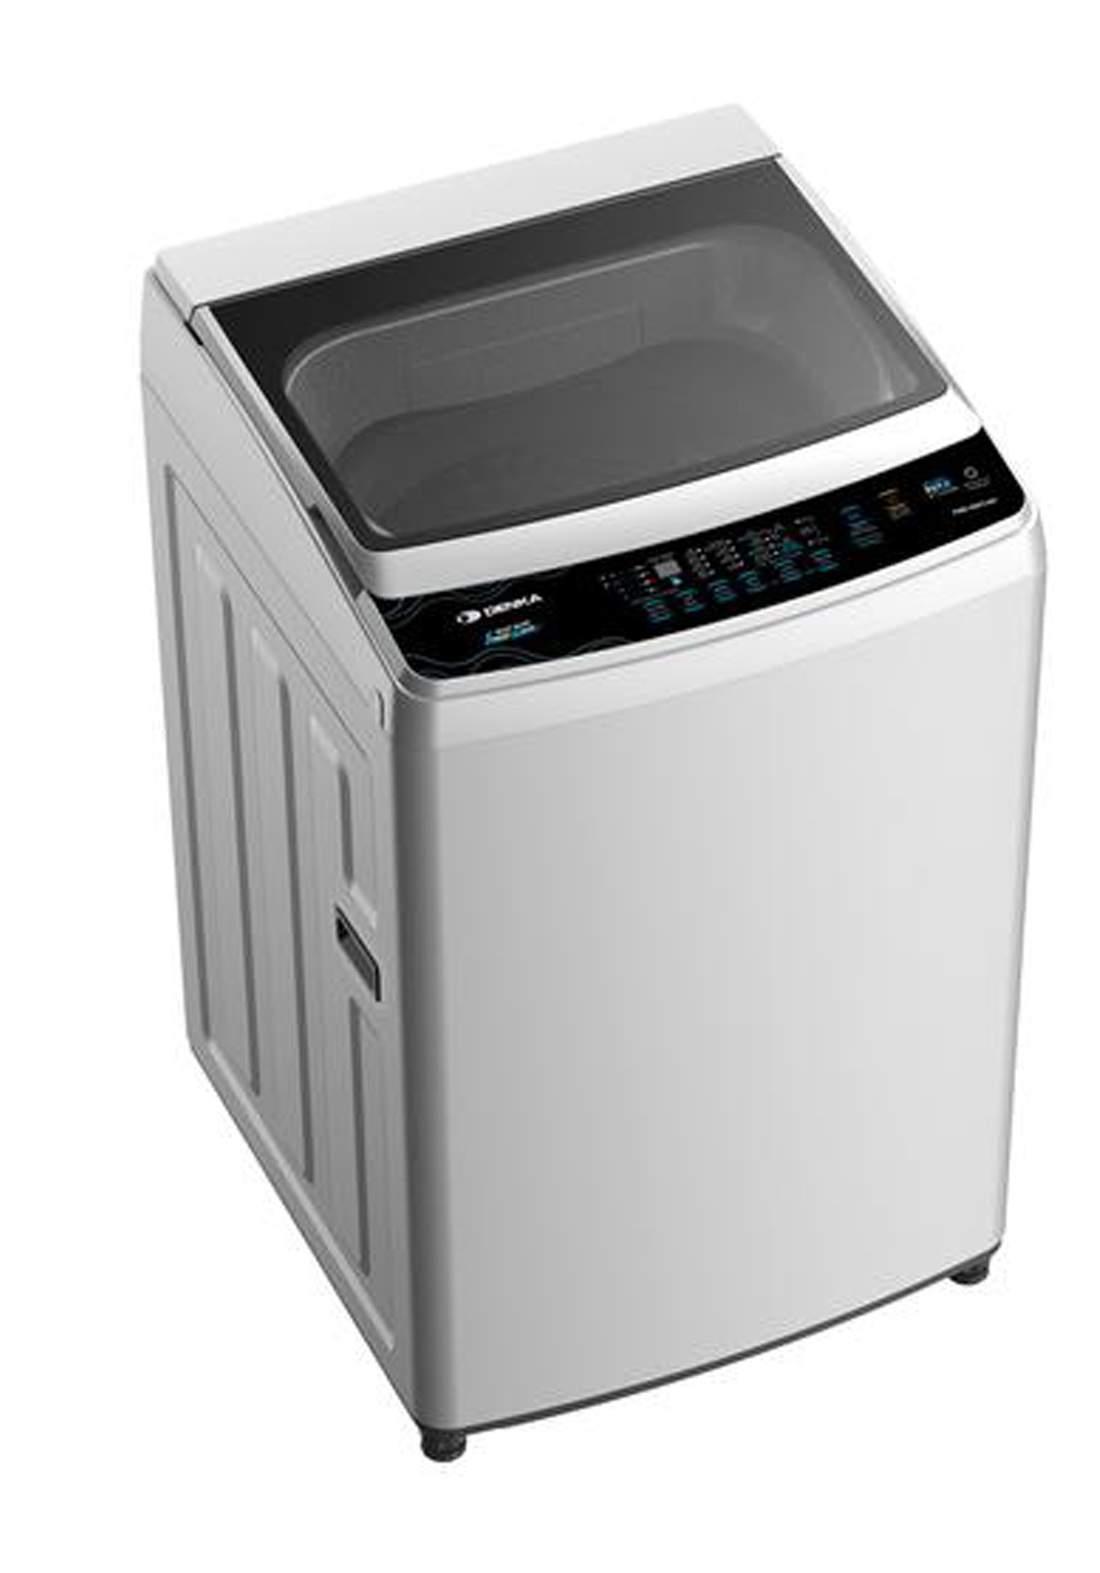 DENKA FWM-1500TLWH  washing machine 15kg  غسالة ملابس